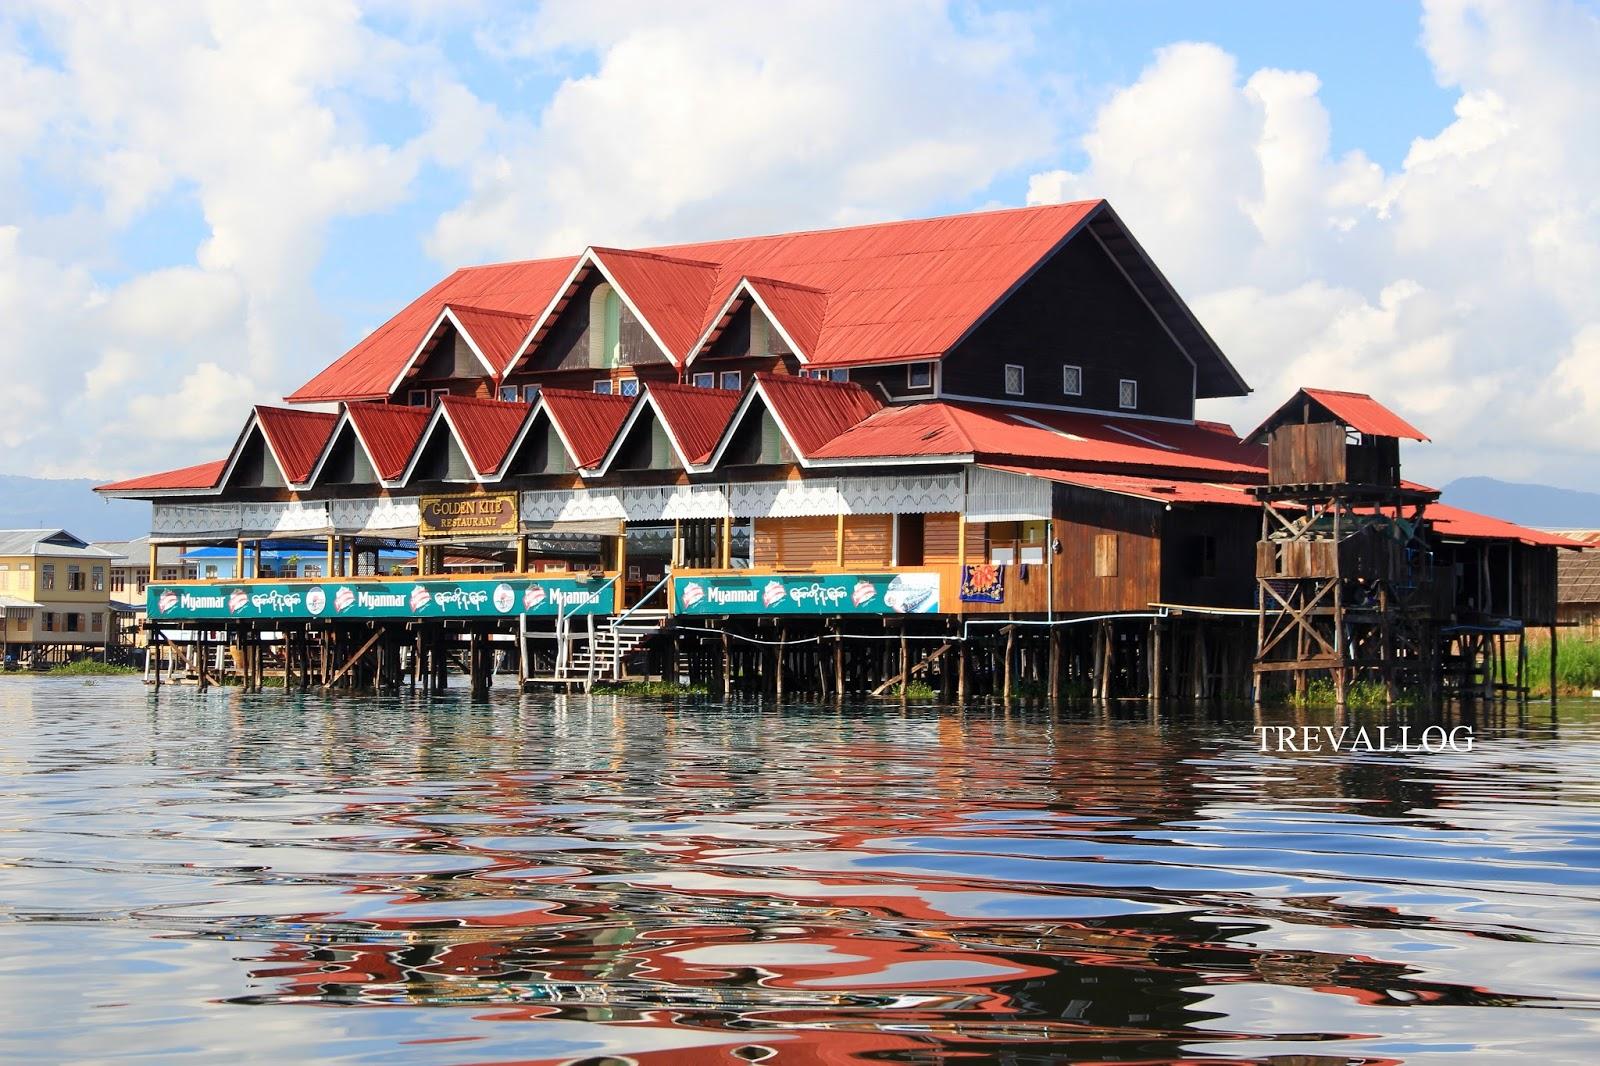 Restaurant in Inle Lake, Myanmar